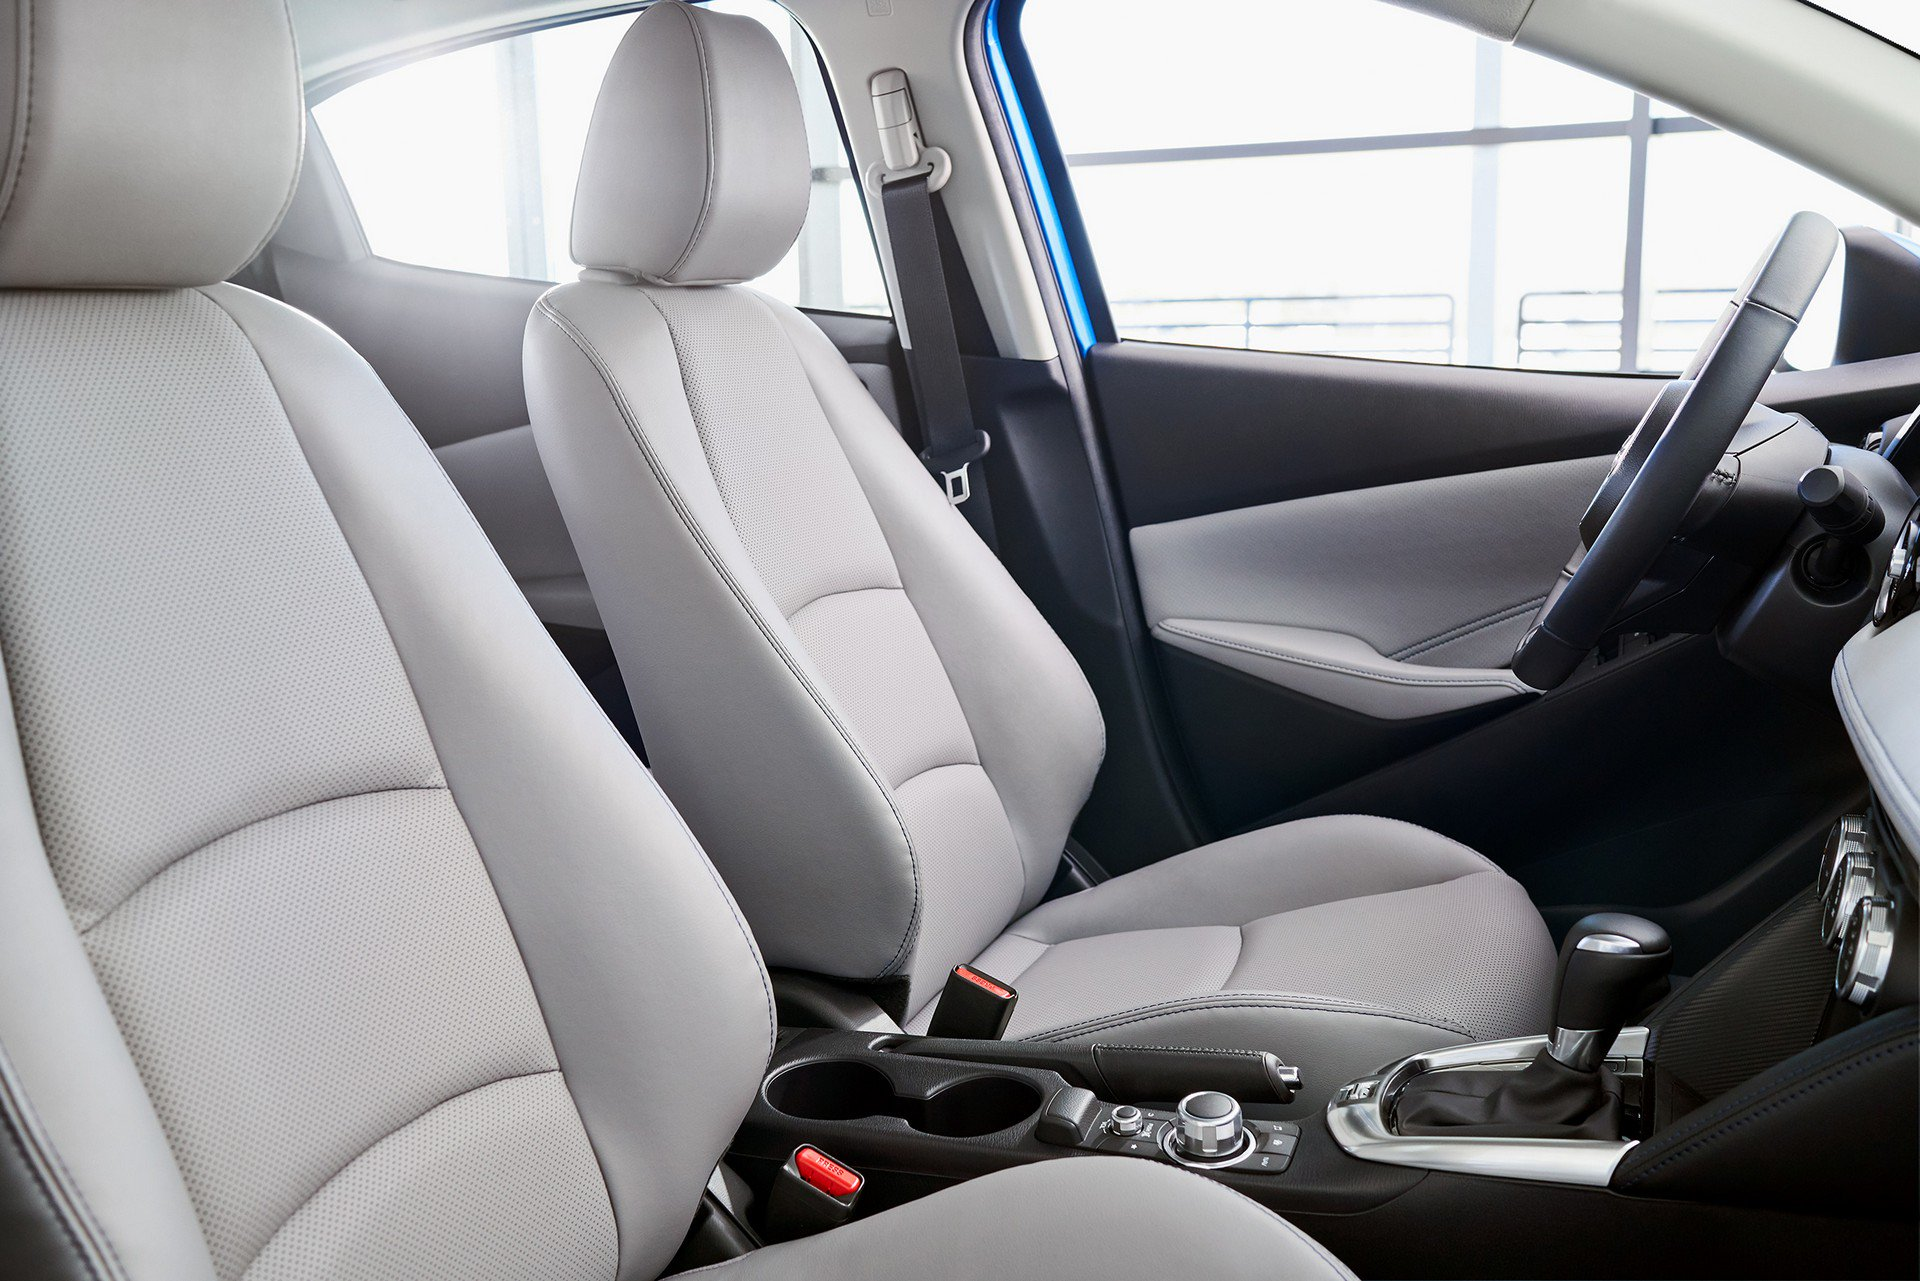 Toyota-Yaris-Hatchback-2020-11